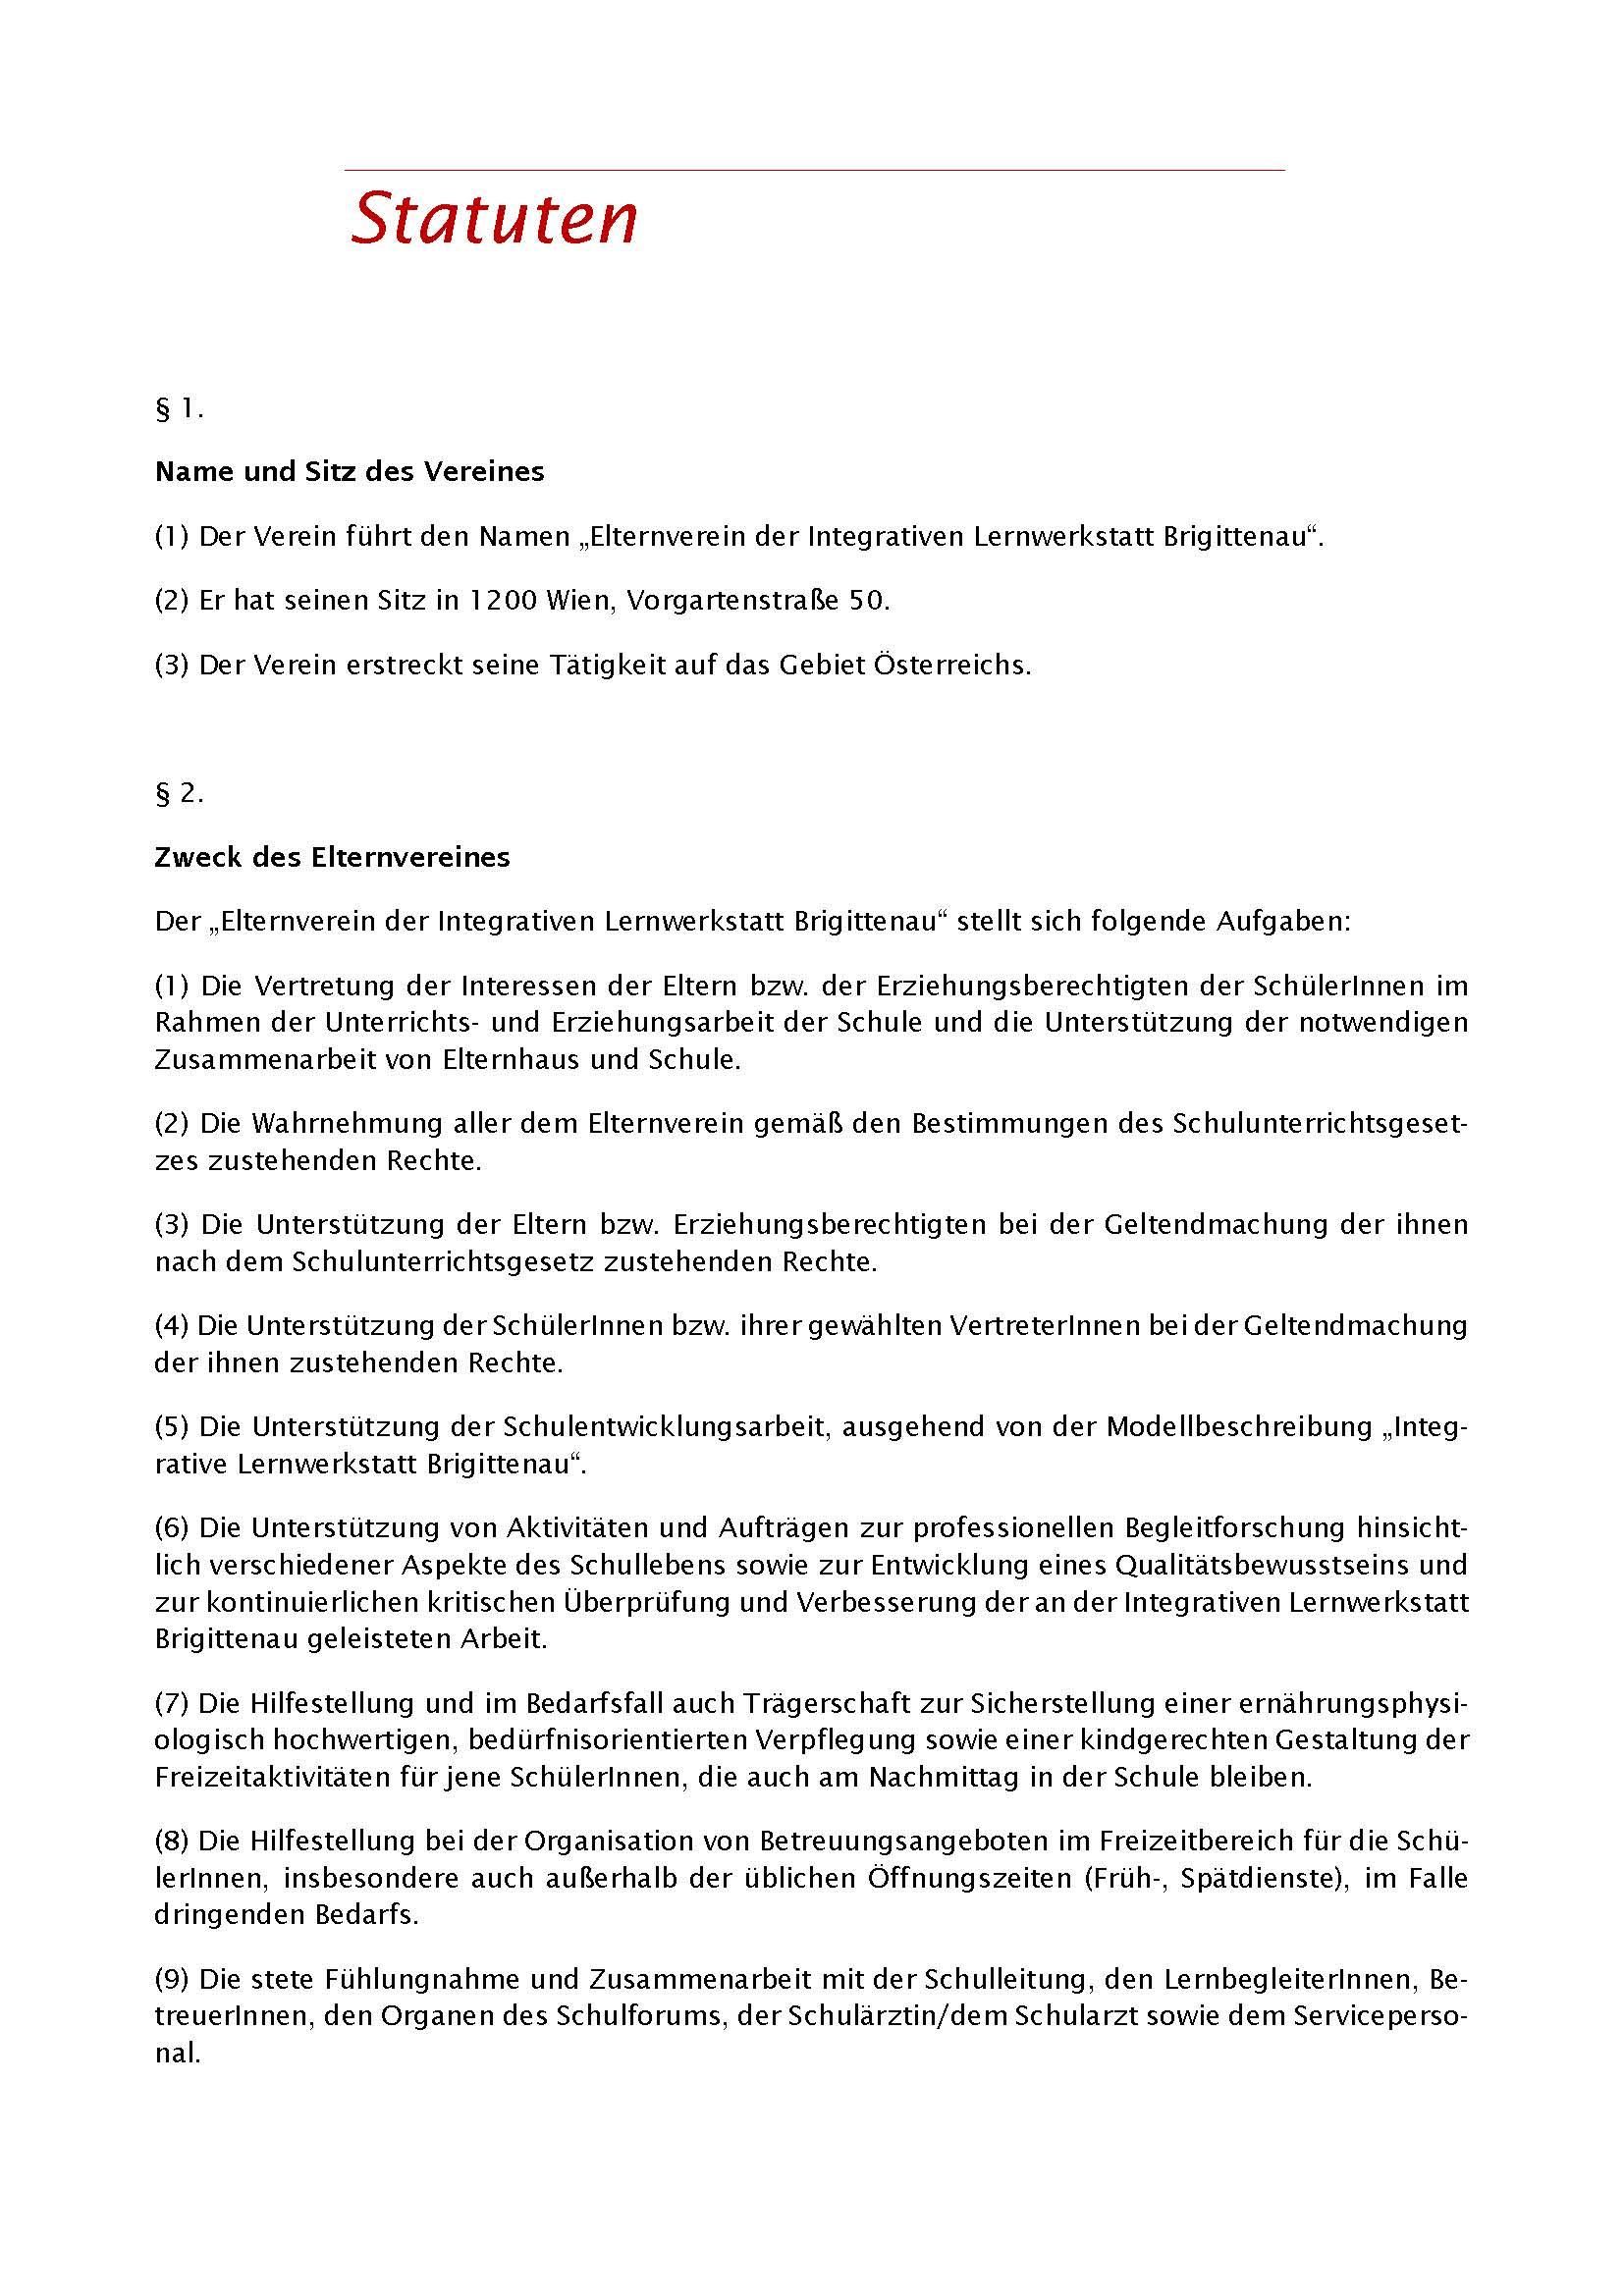 Statuten_EV_ILB_Seite_1